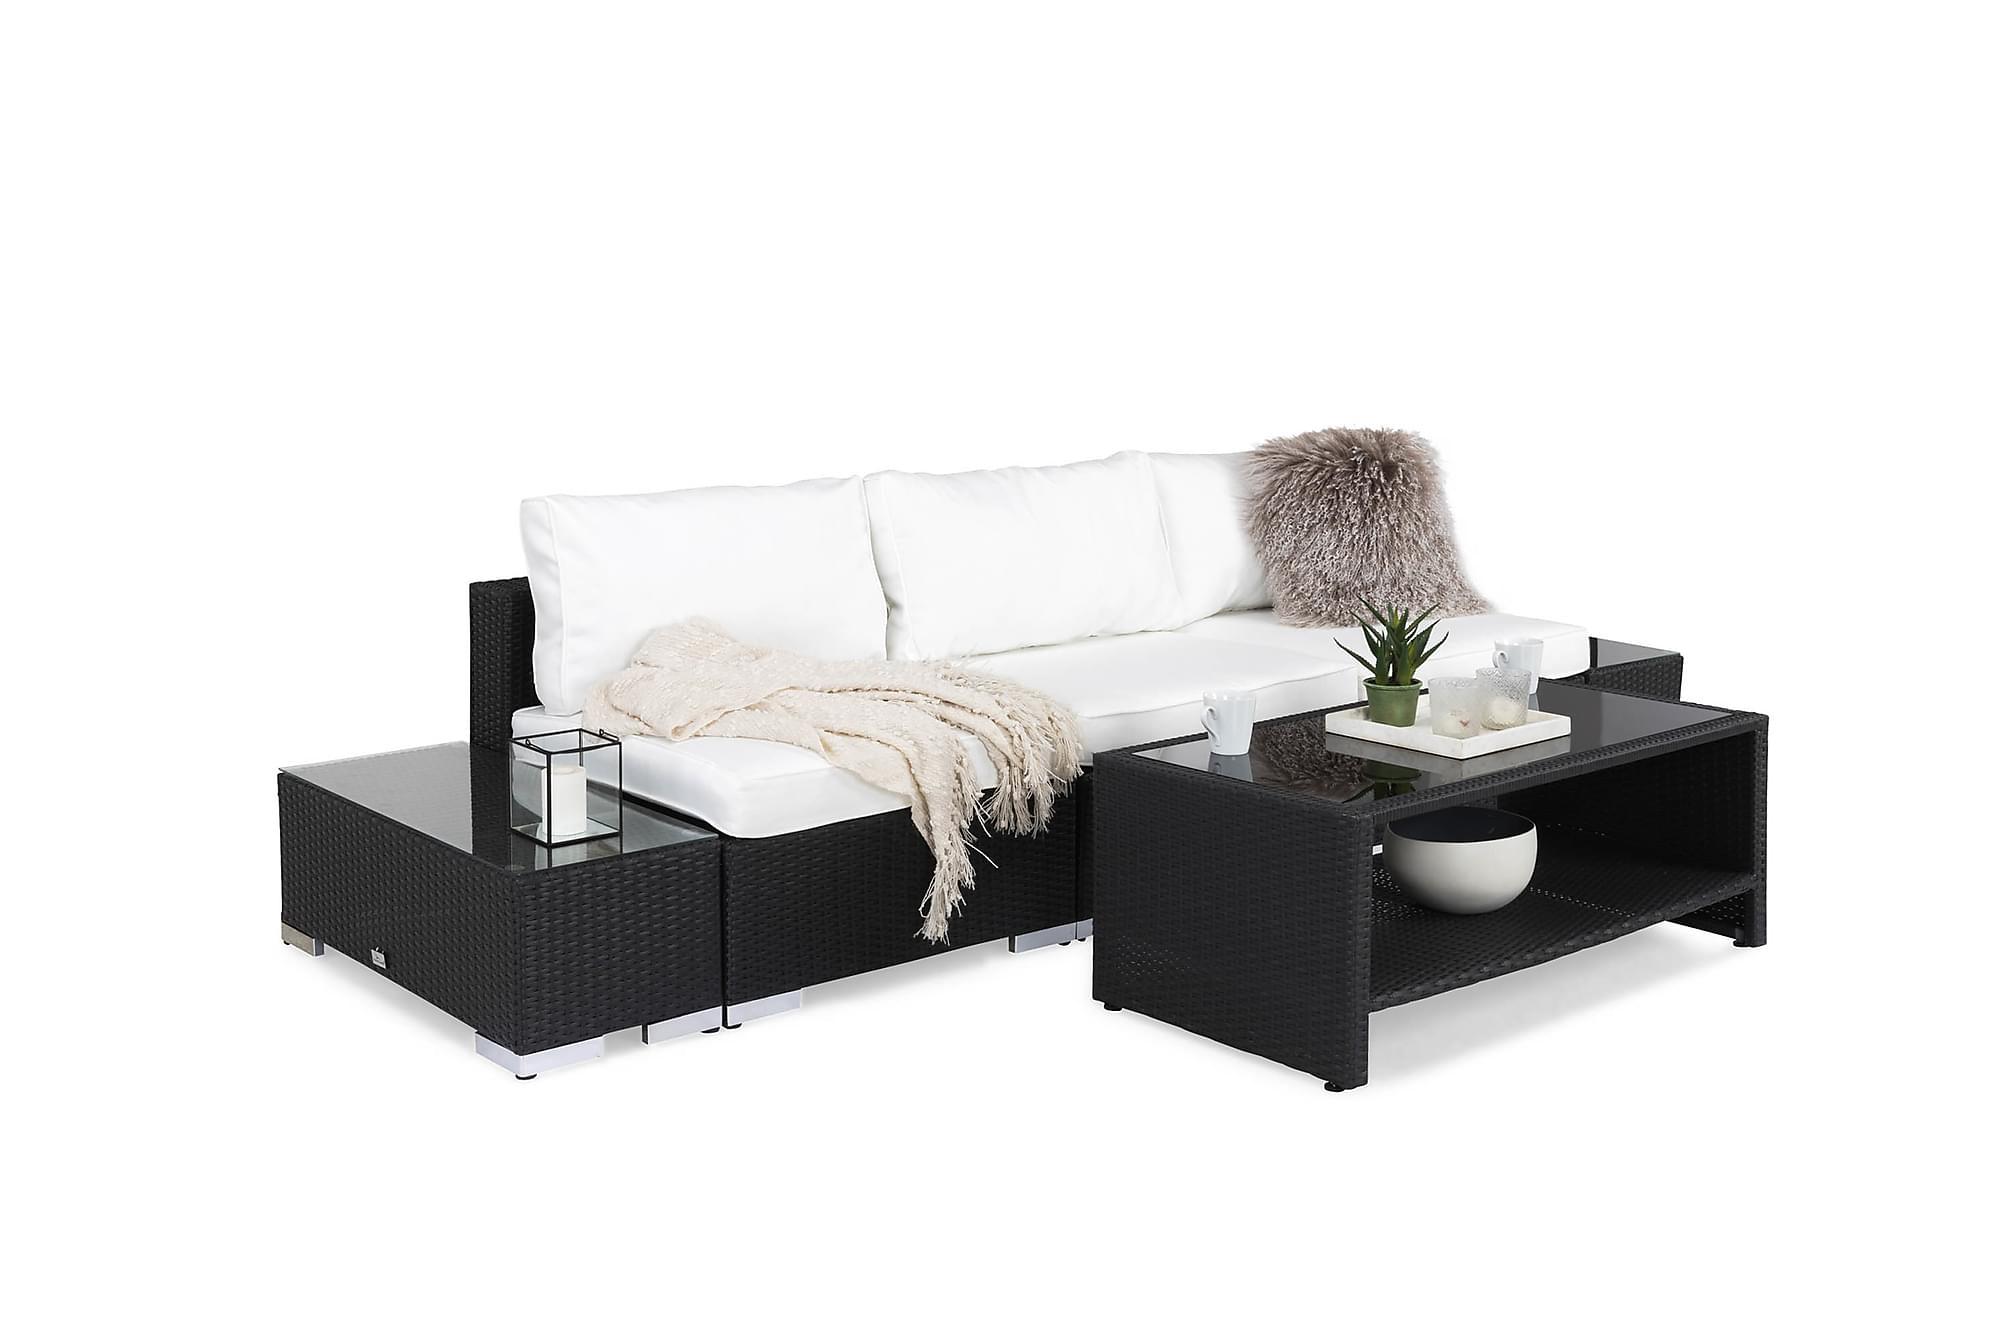 BAHAMAS Loungesoffa 3-sits + Bord Hylla + 2 Sidobord Svart